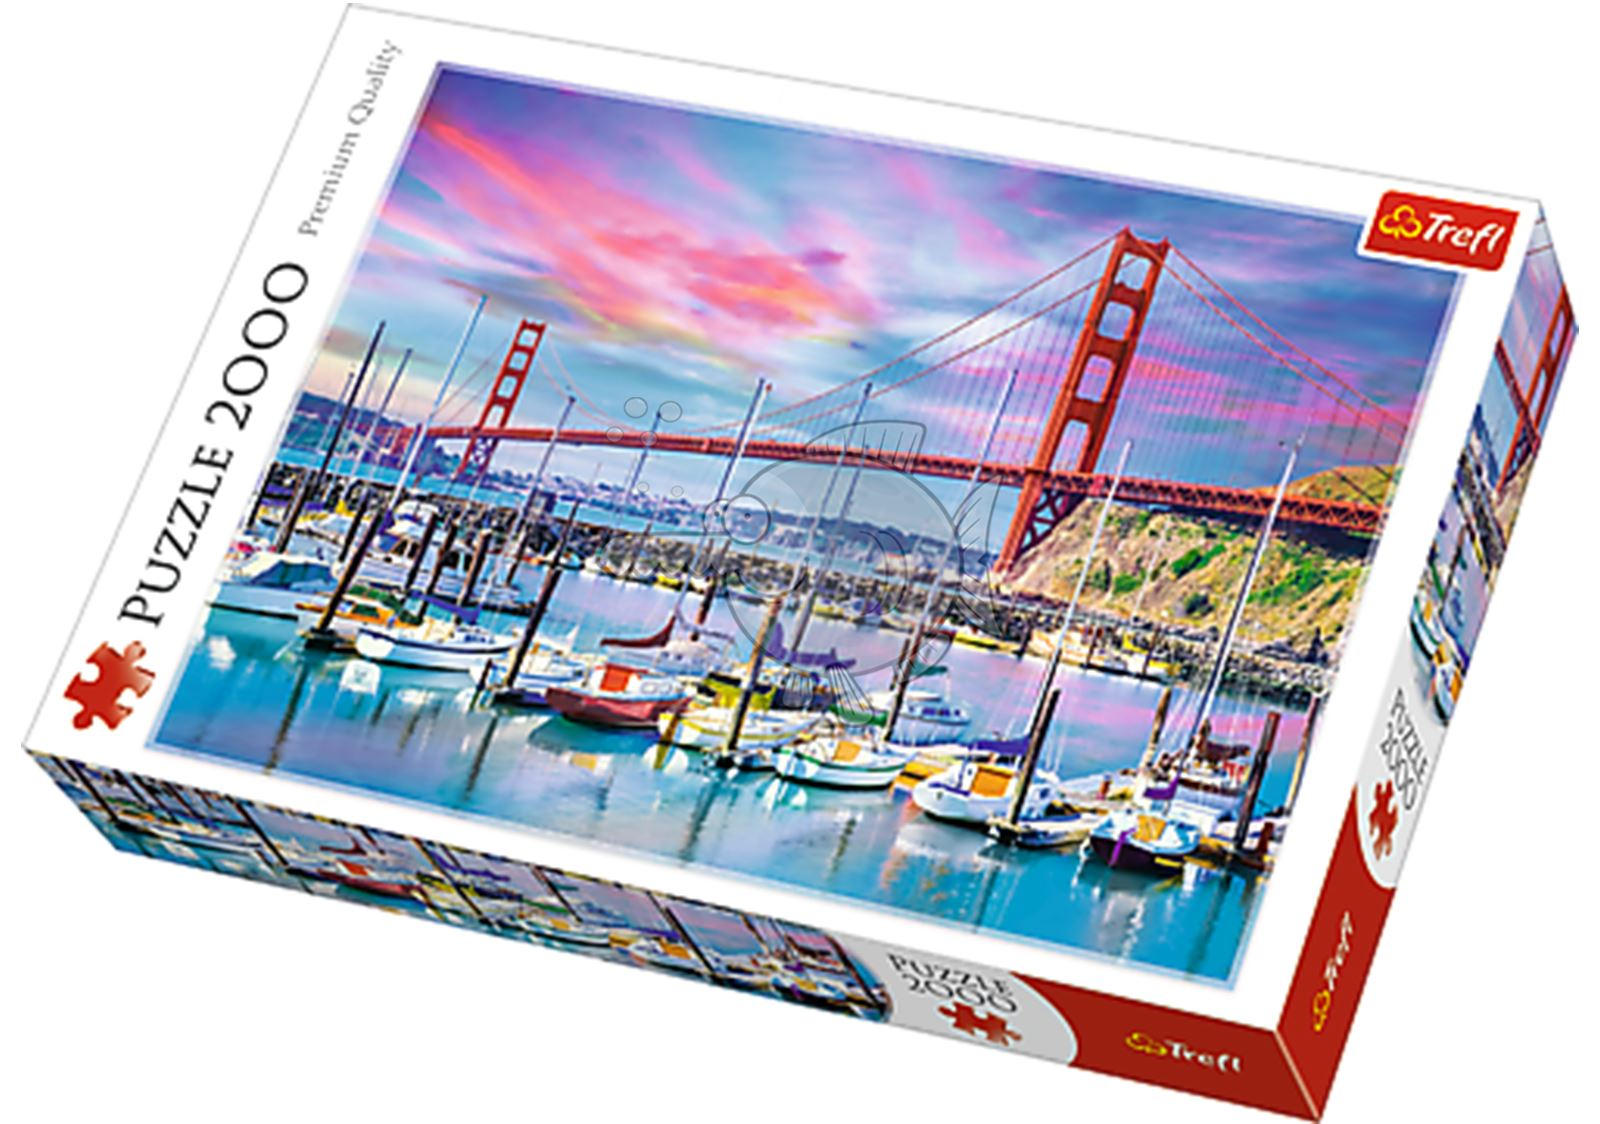 Trefl-300-500-1000-1500-2000-3000-4000-6000-Piece-Jigsaw-Puzzle-Landscapes-City thumbnail 144